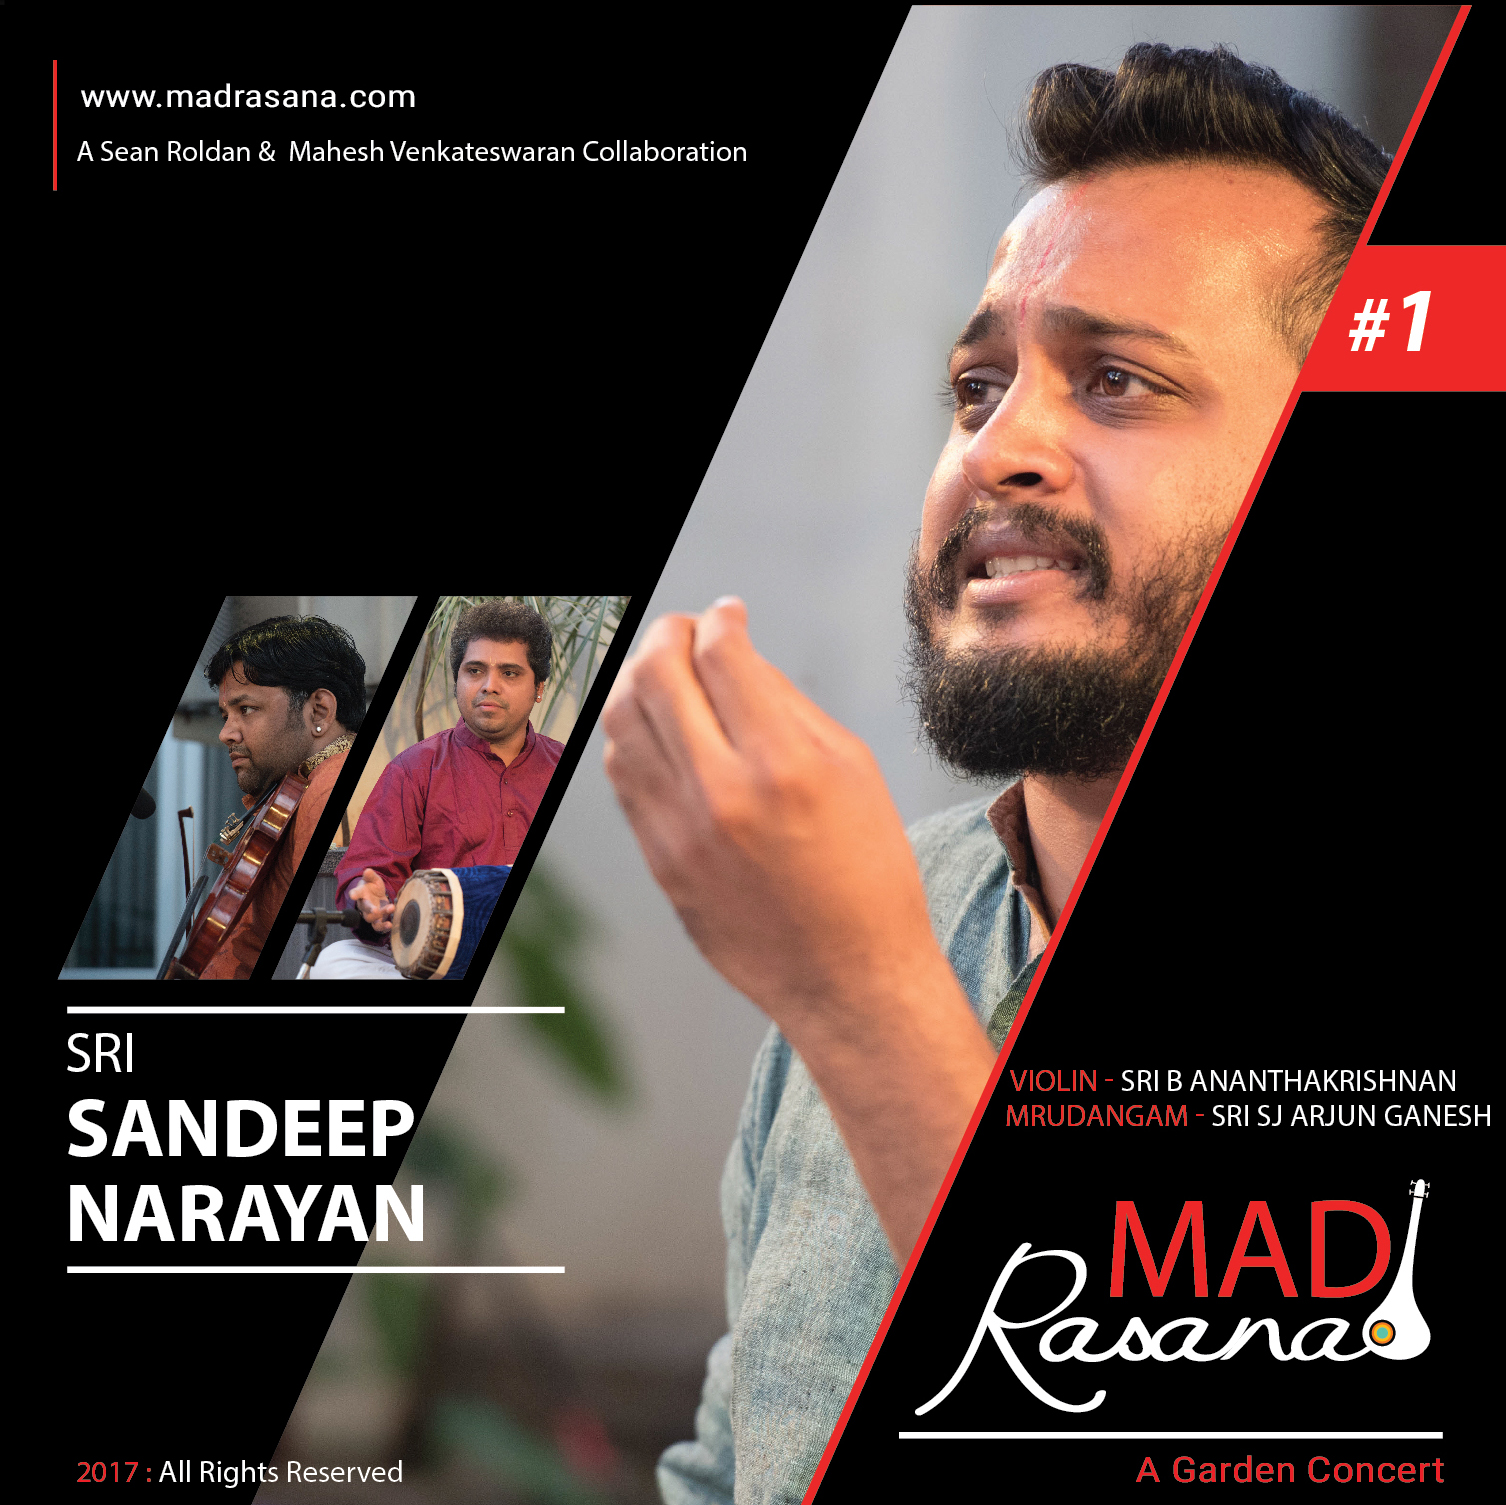 Sandeep Narayan